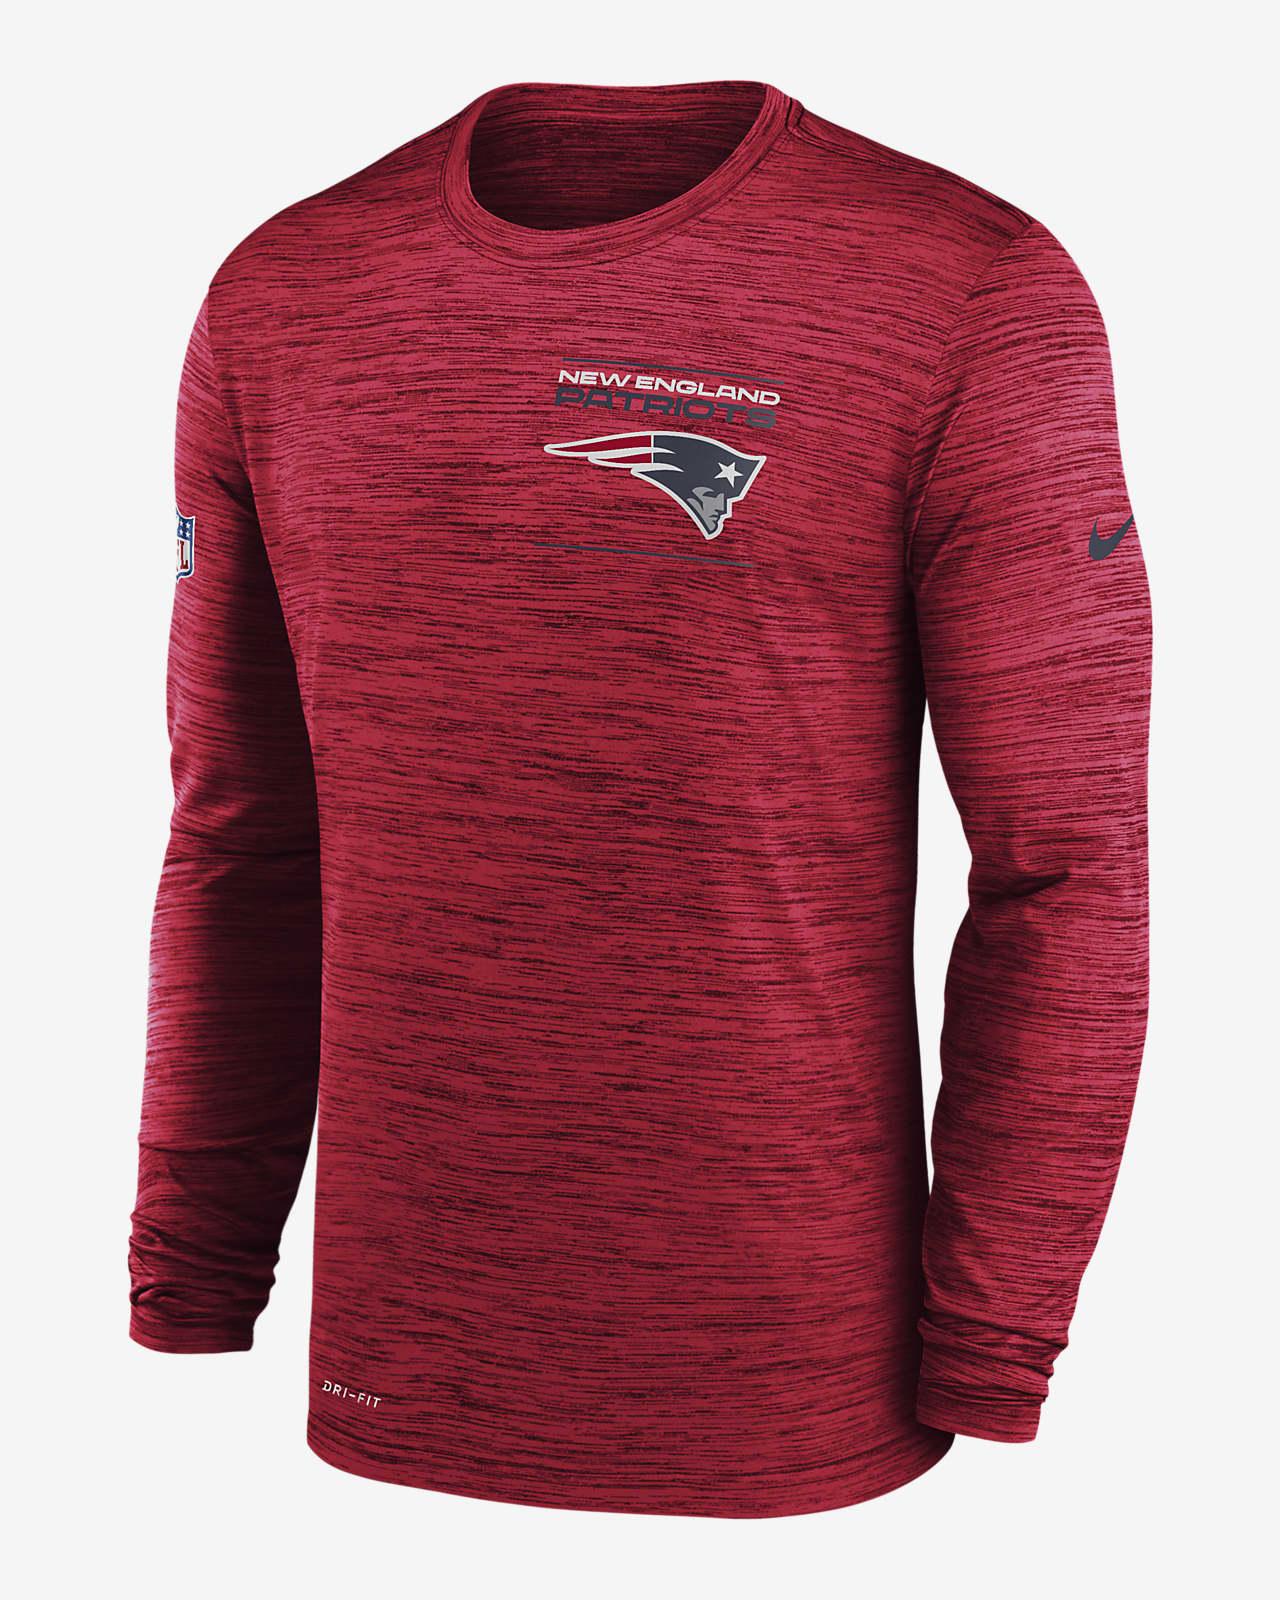 Nike Dri-FIT Sideline Velocity Legend (NFL New England Patriots) Men's Long-Sleeve T-Shirt